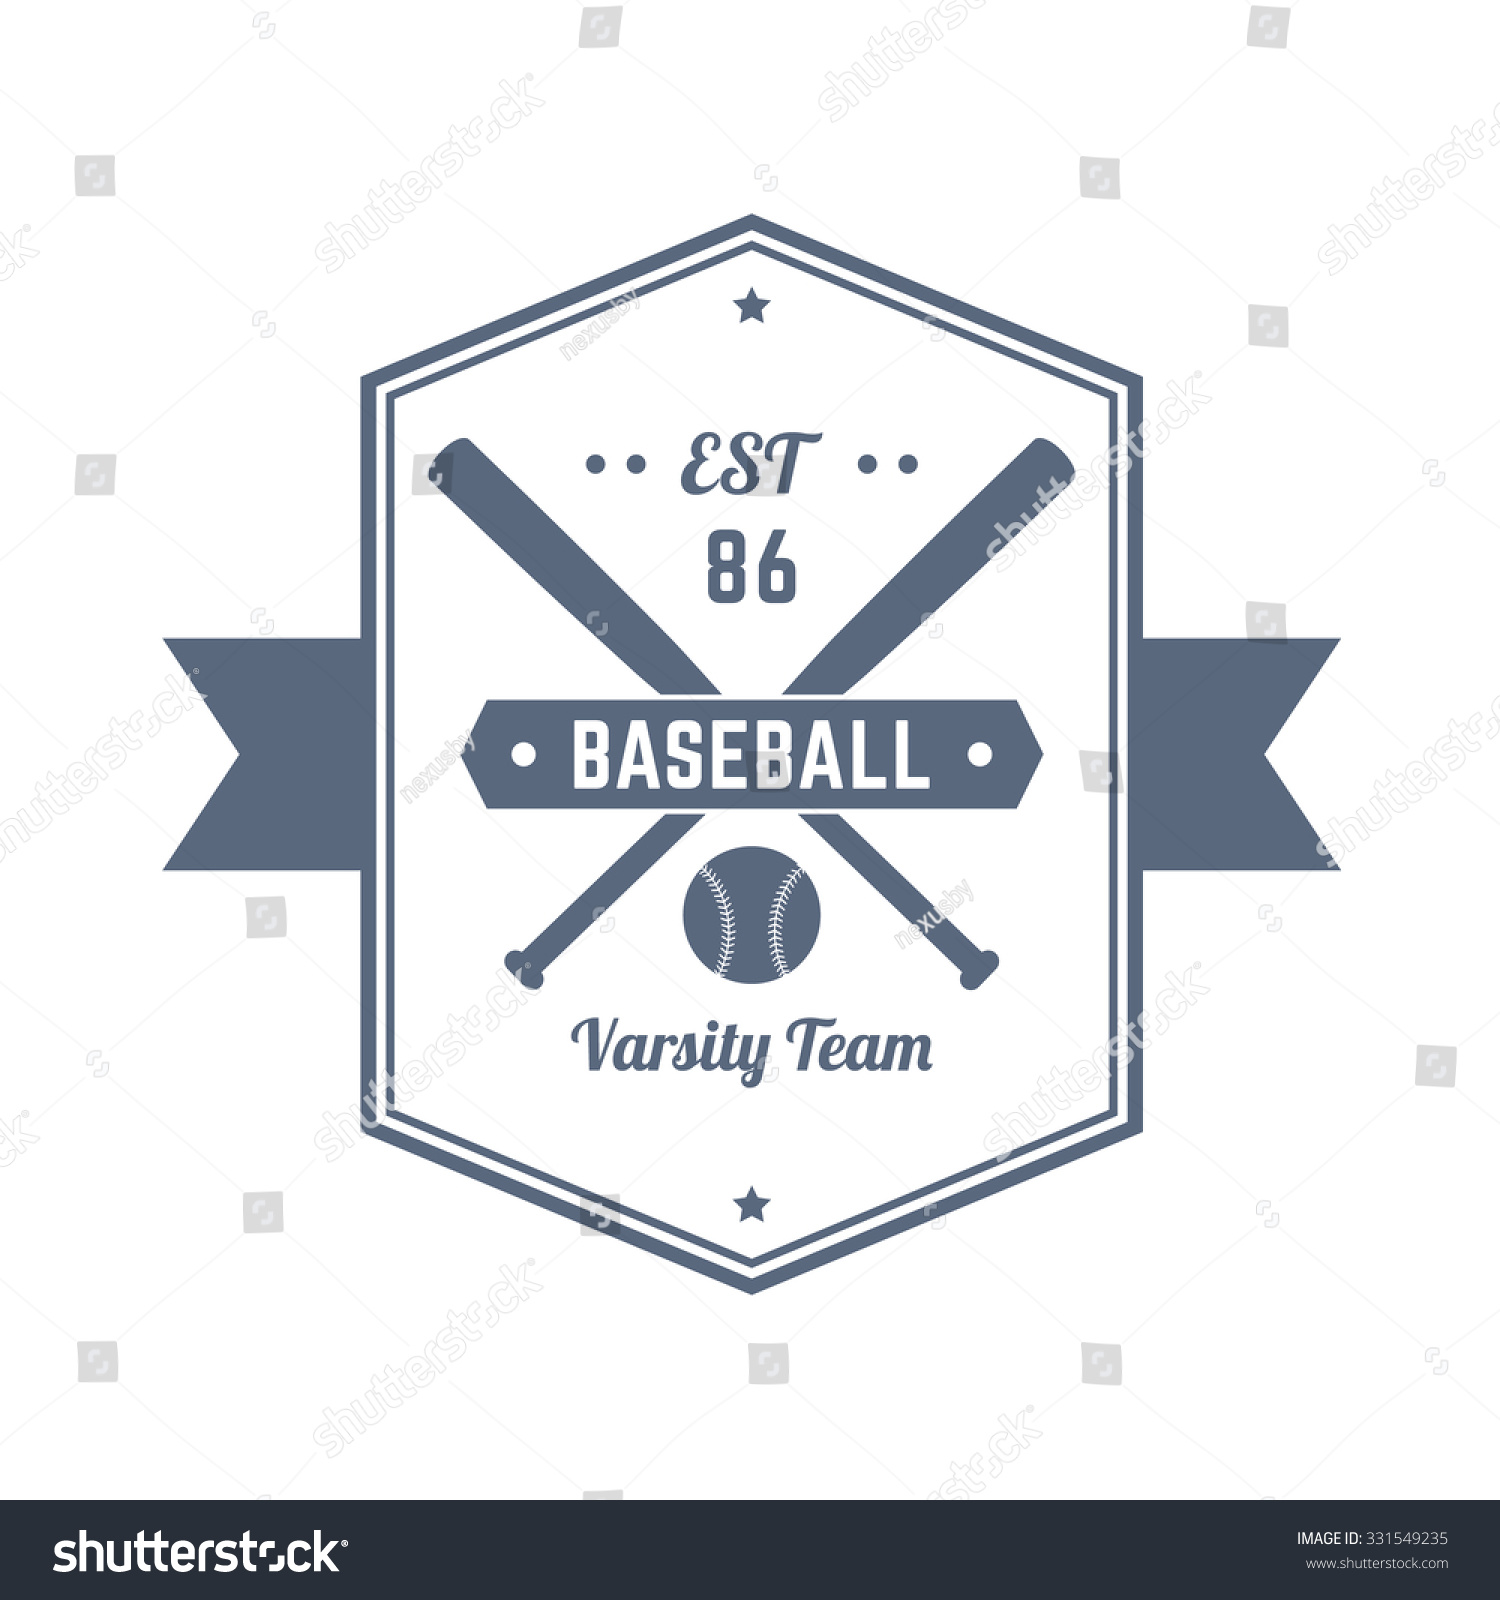 Baseball Team 86 Vintage Emblem, Logo, T-Shirt Design, Print